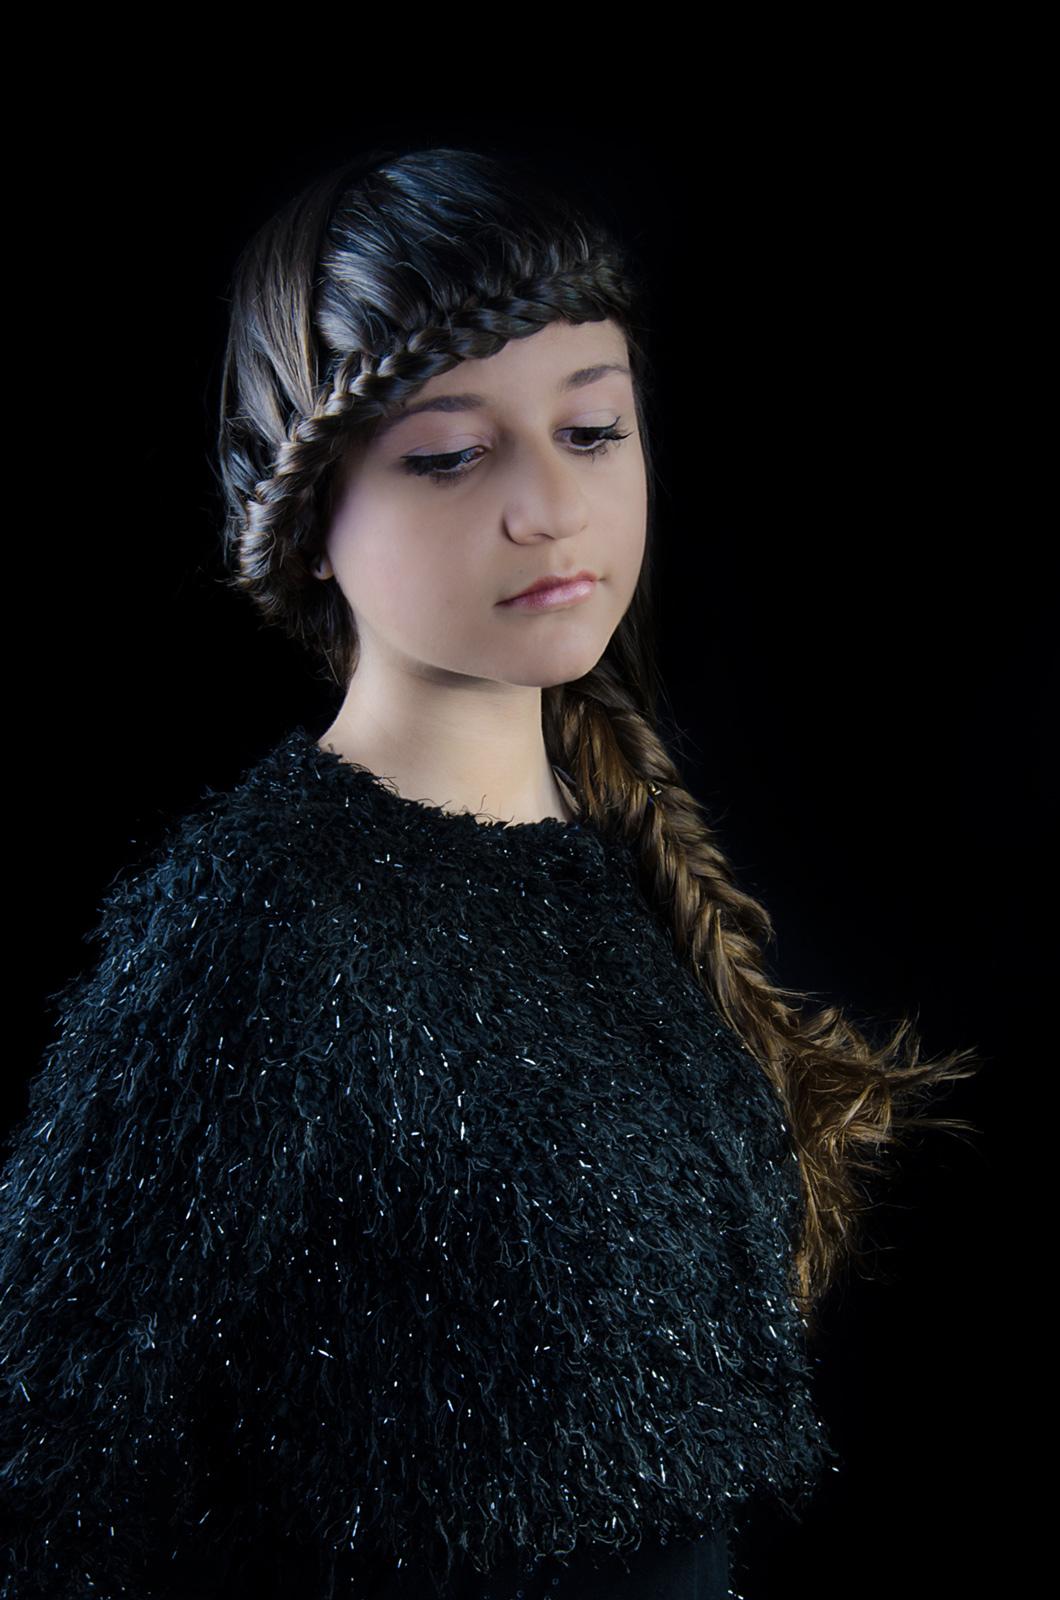 immagine_donna_parrucchieri_torregrotta_messina_estetista_parrucchiere_uomo-donna_cosmetici_salone_valeria7